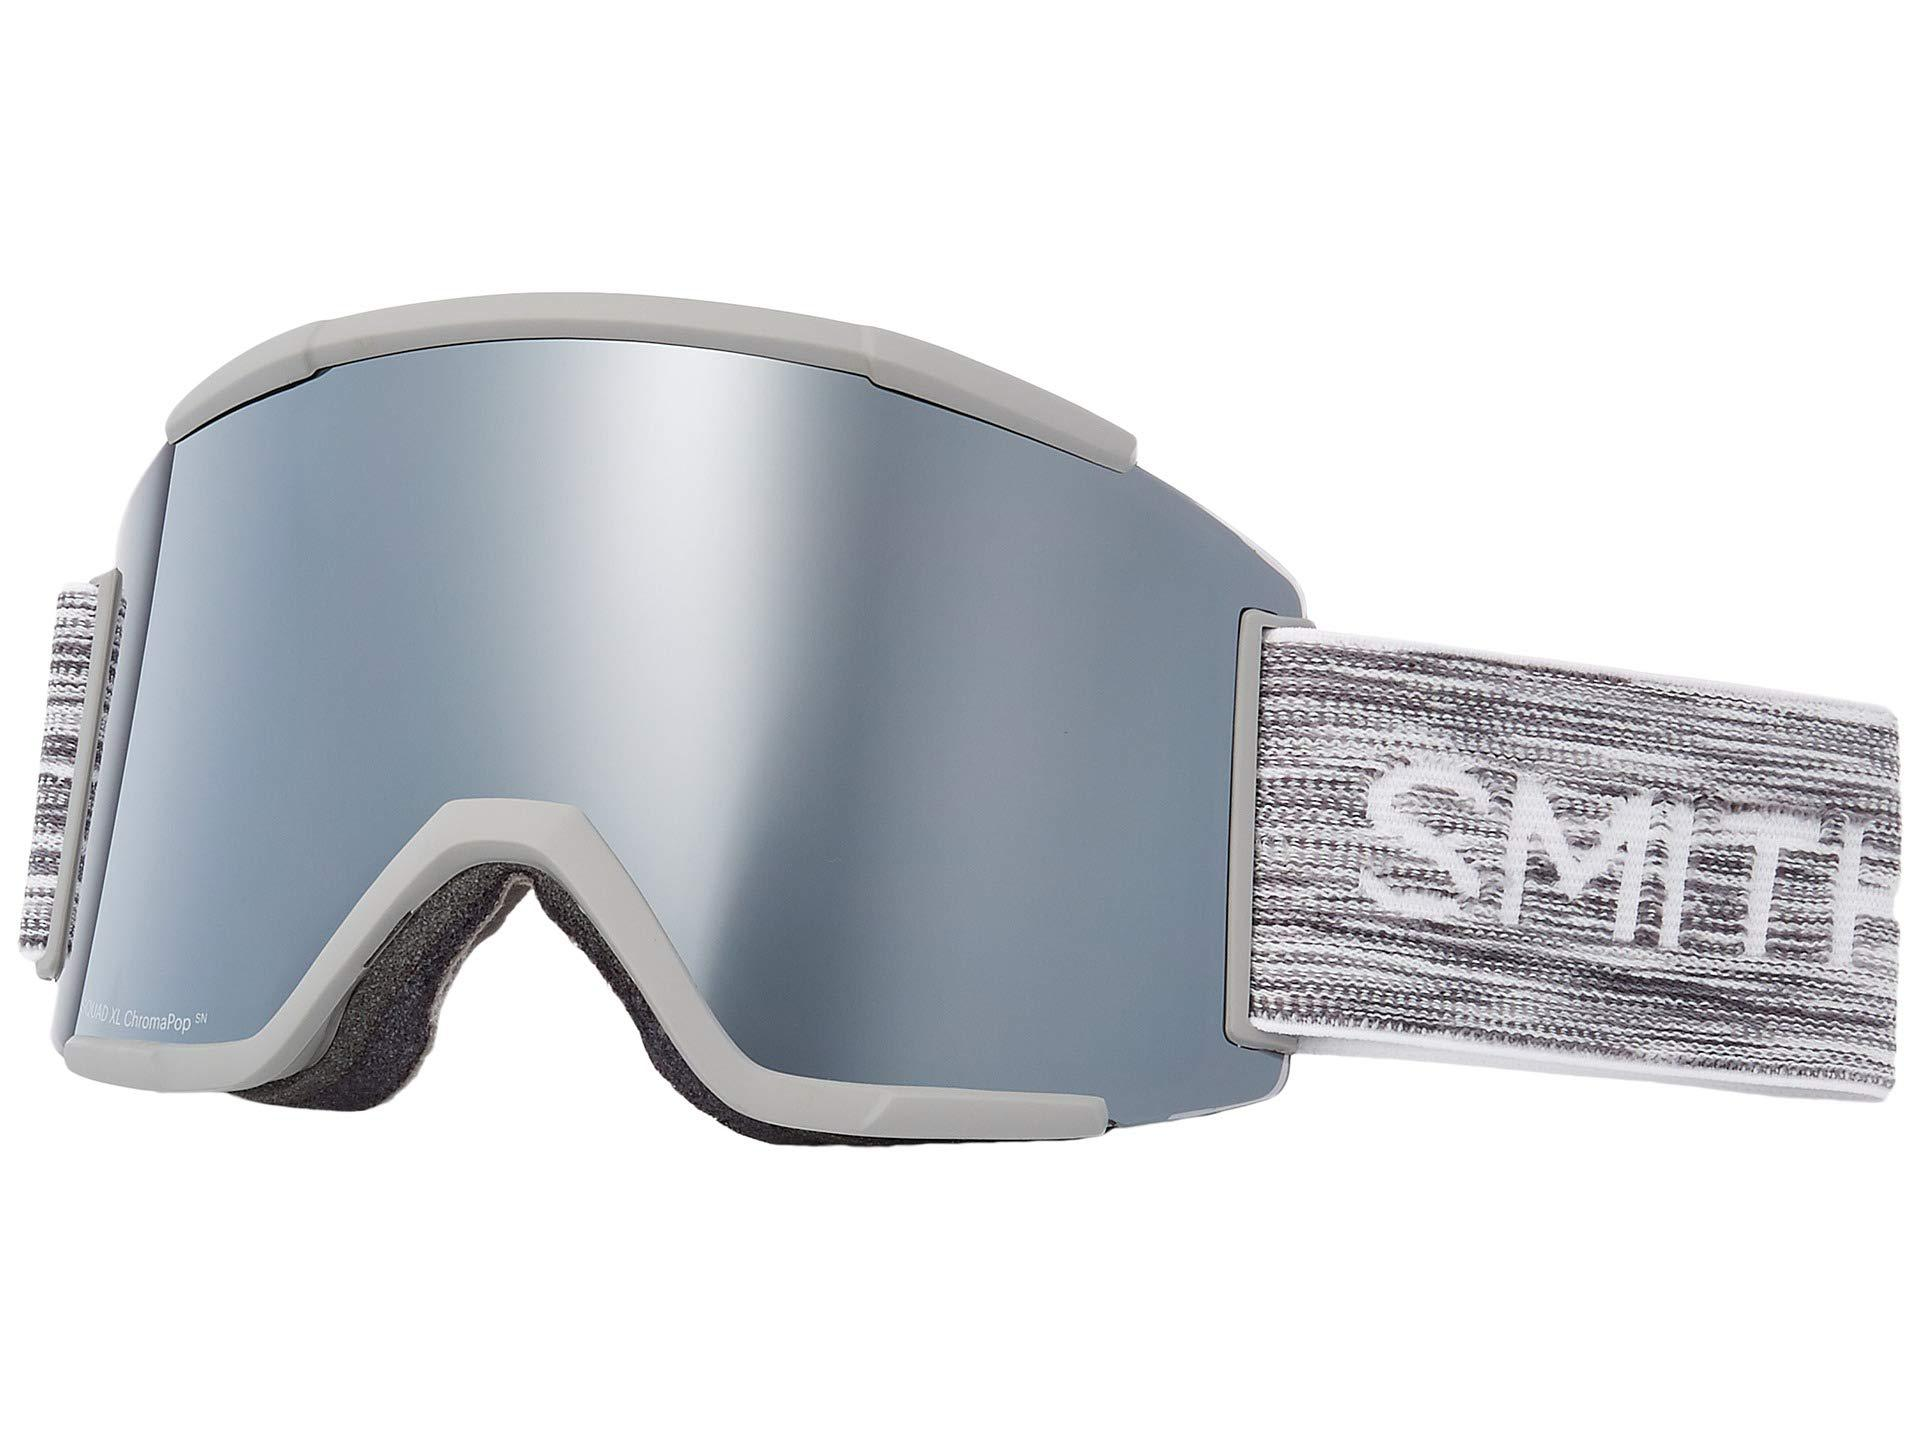 b7dc143b77 Lyst - Smith Optics Squad Xl Goggle (cloud Grey chromapop Sun ...